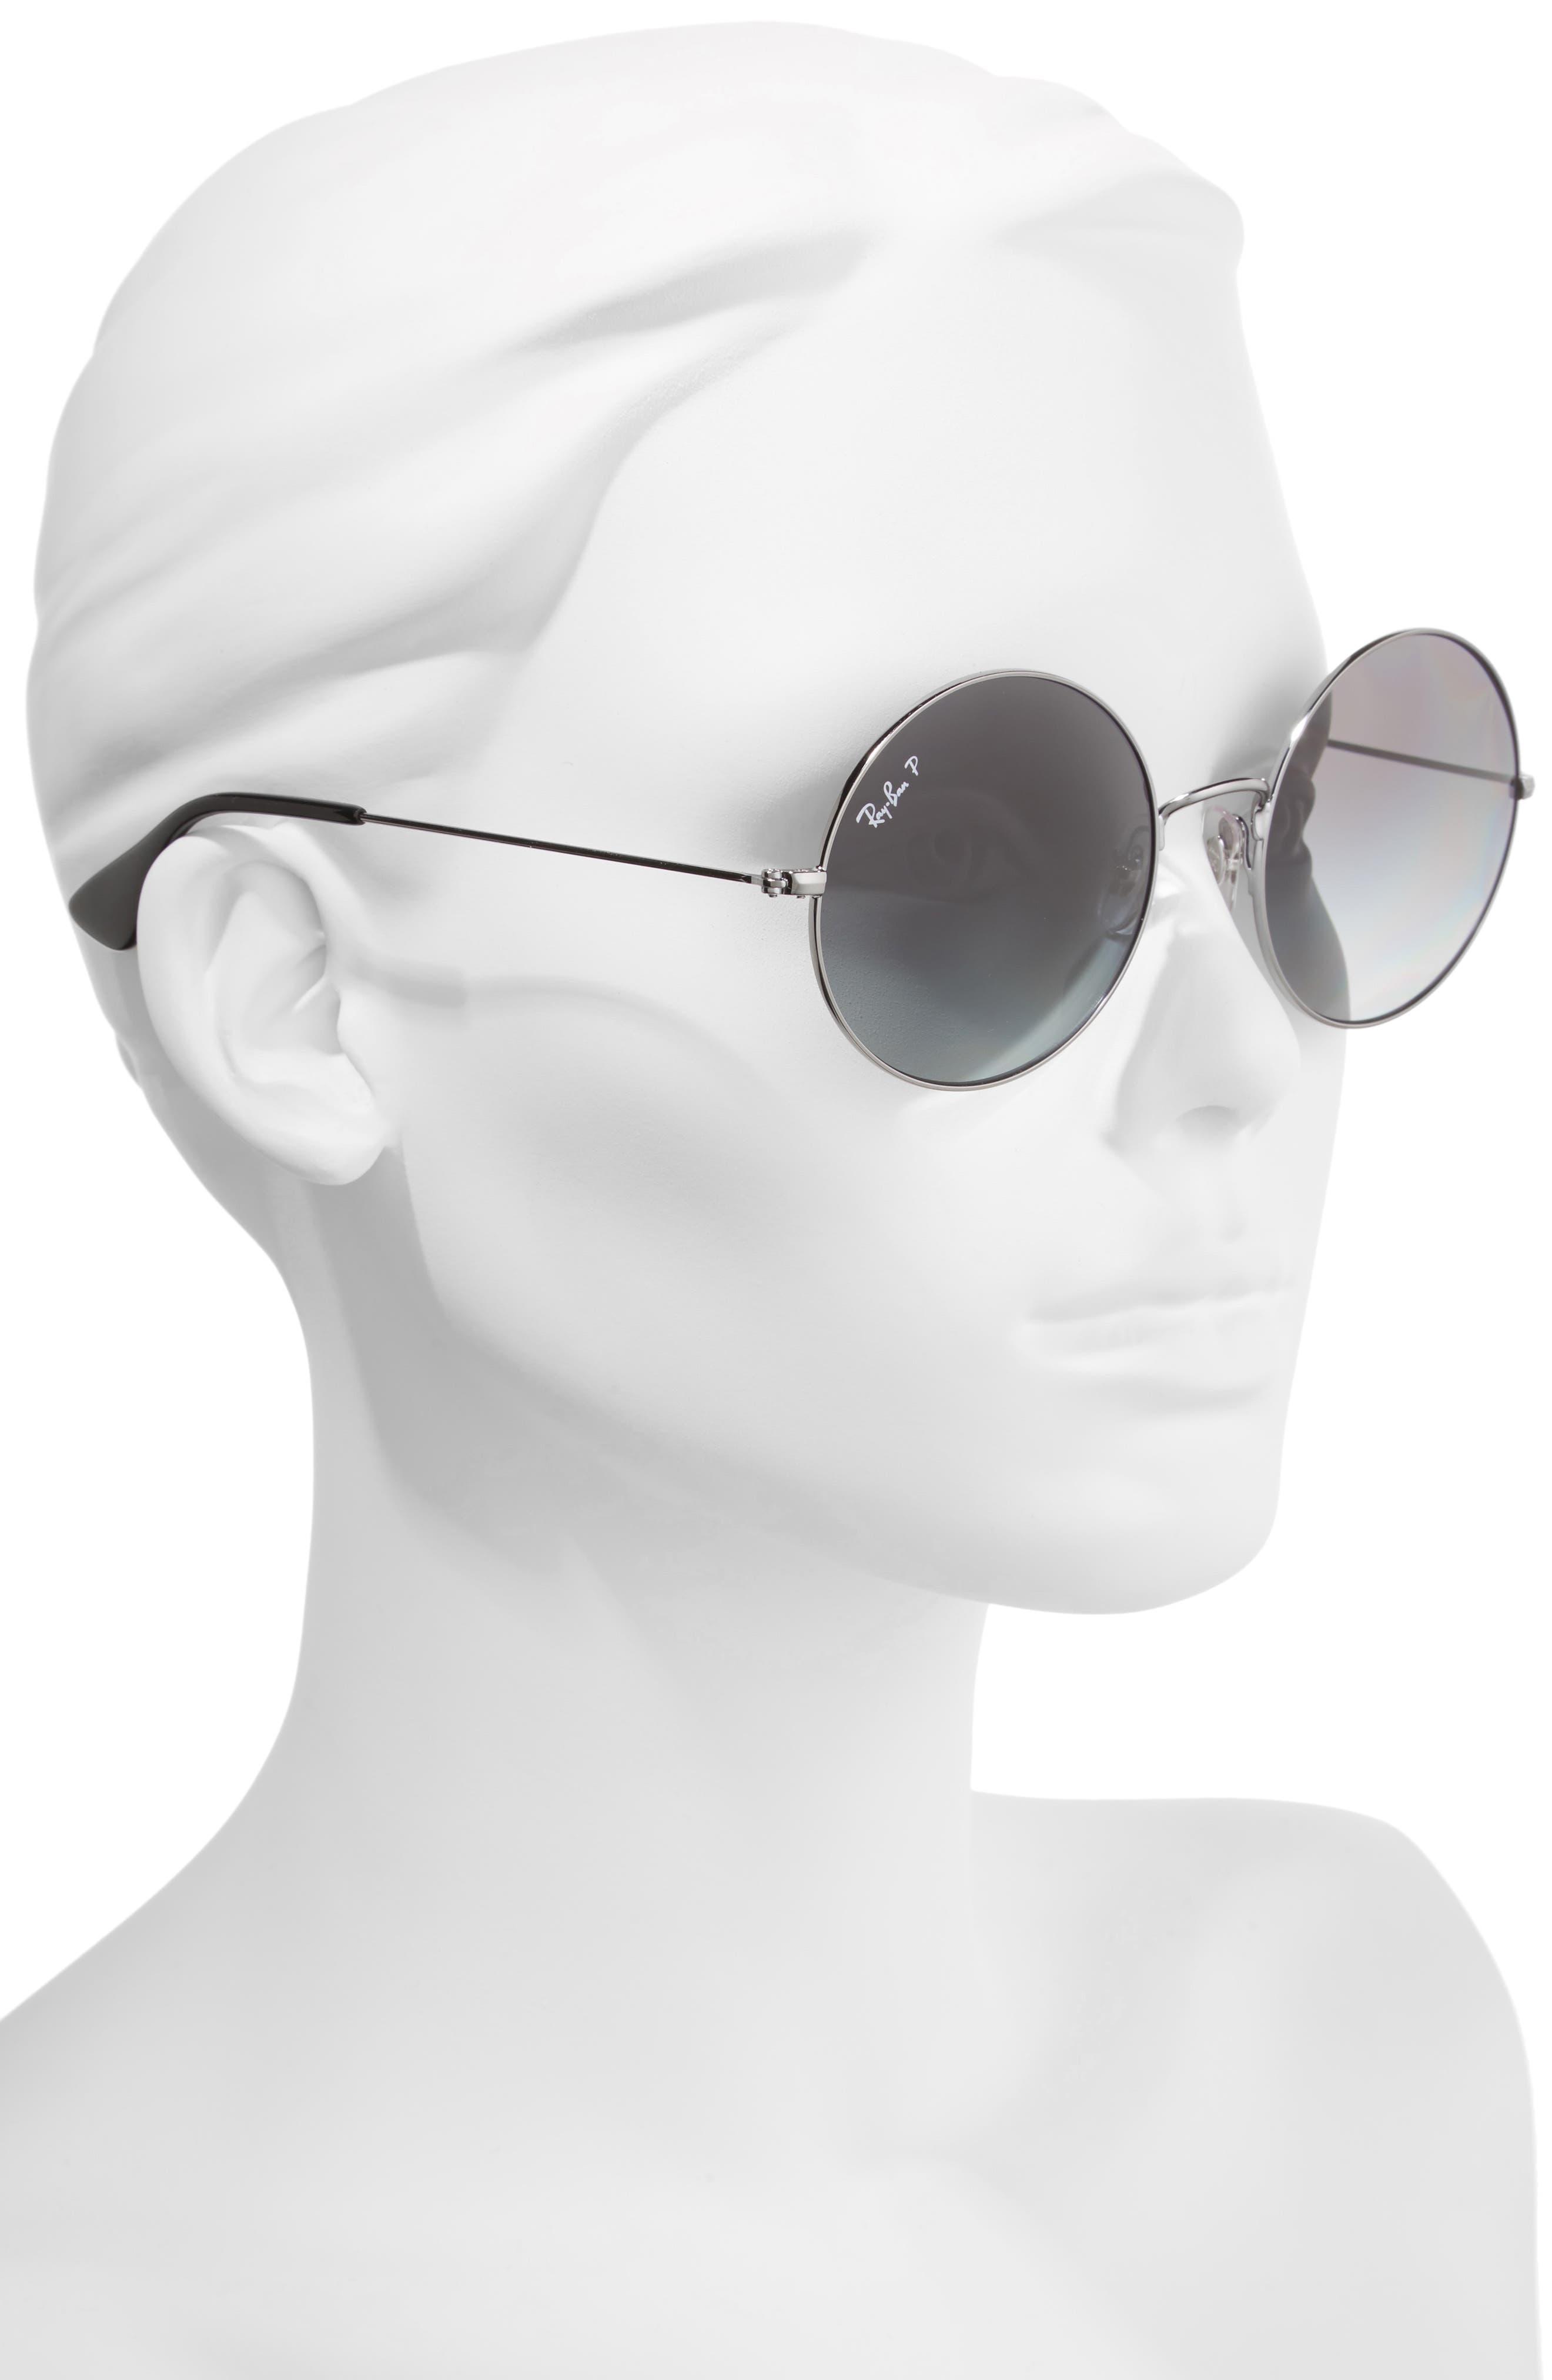 55mm Polarized Round Sunglasses,                             Alternate thumbnail 3, color,